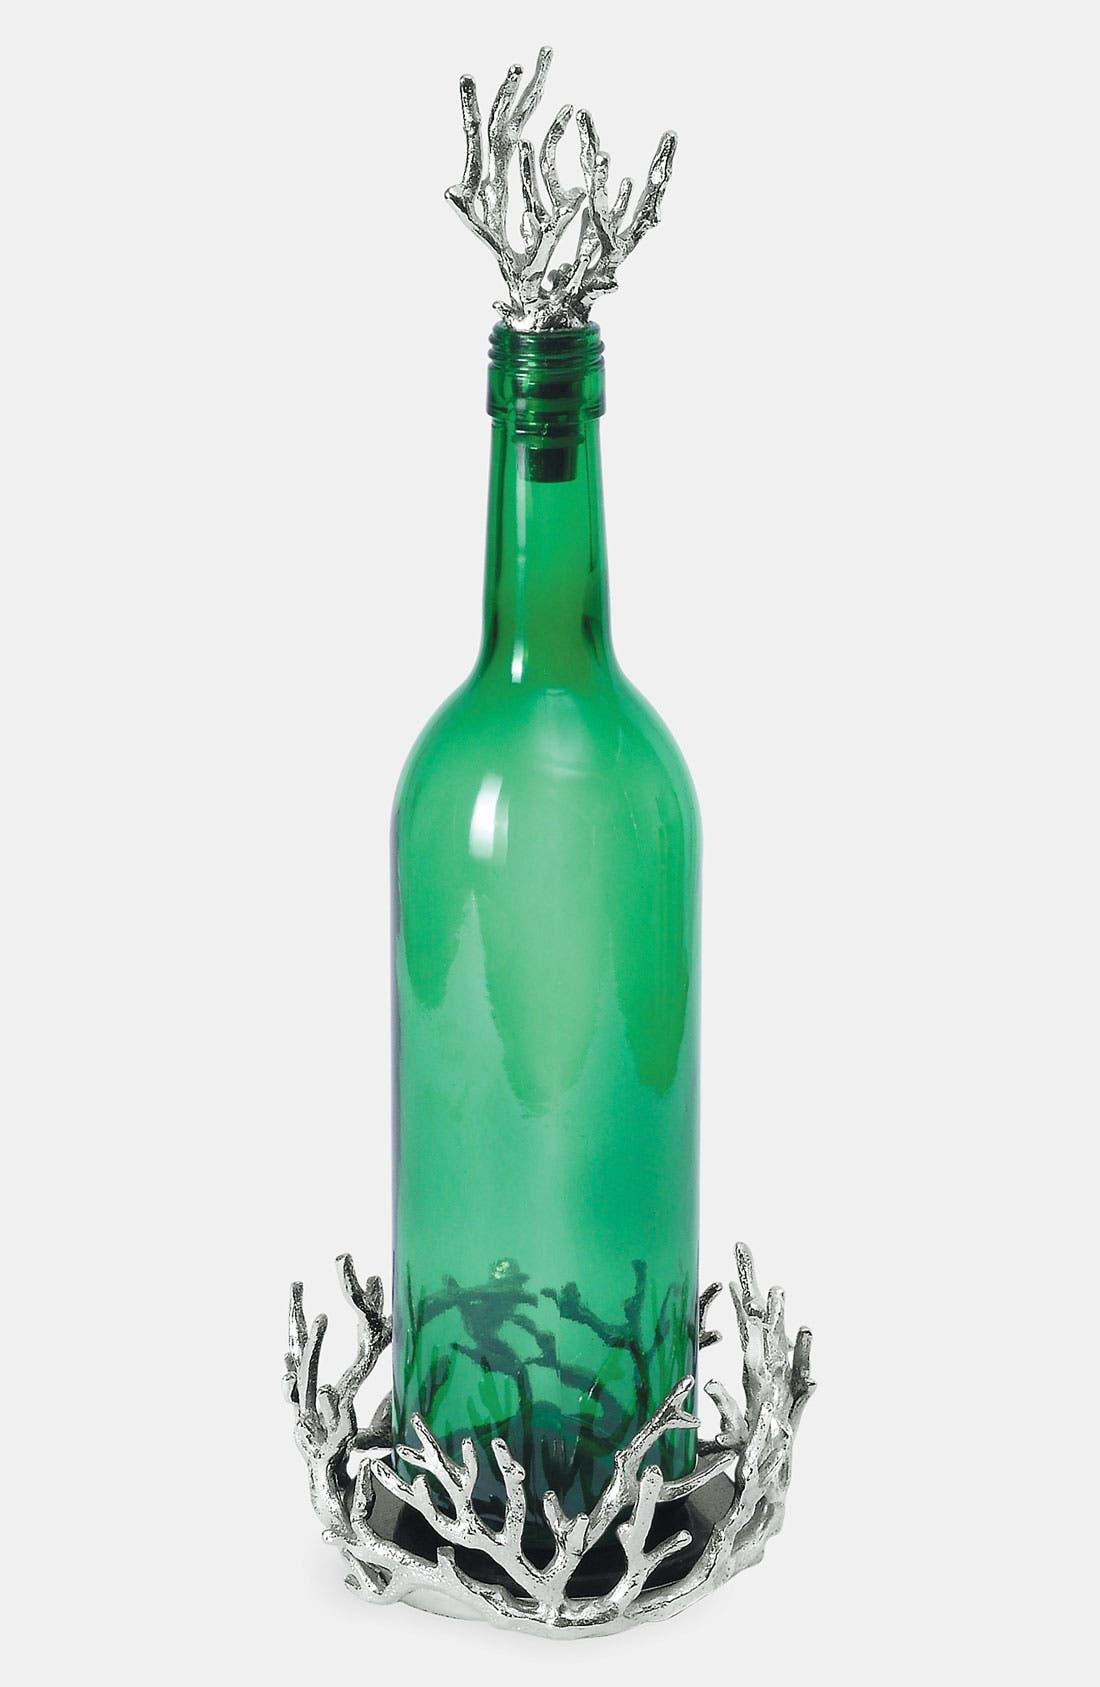 Alternate Image 1 Selected - Michael Aram 'Ocean Coral' Wine Coaster & Stopper